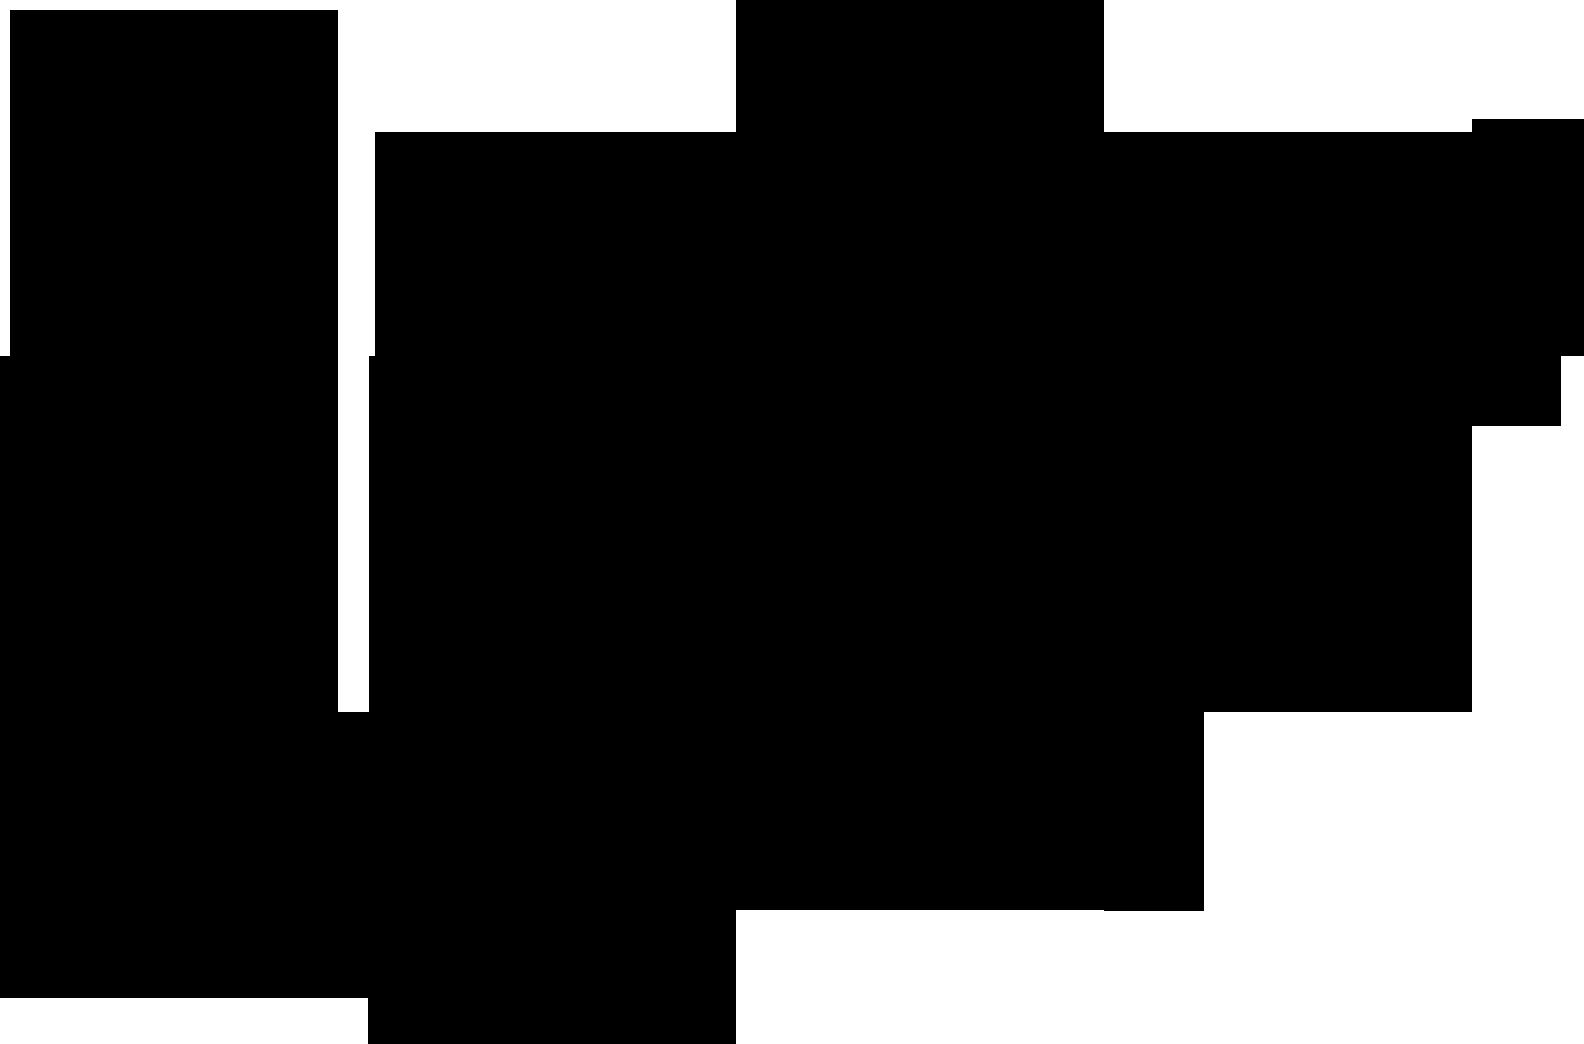 Carbo light